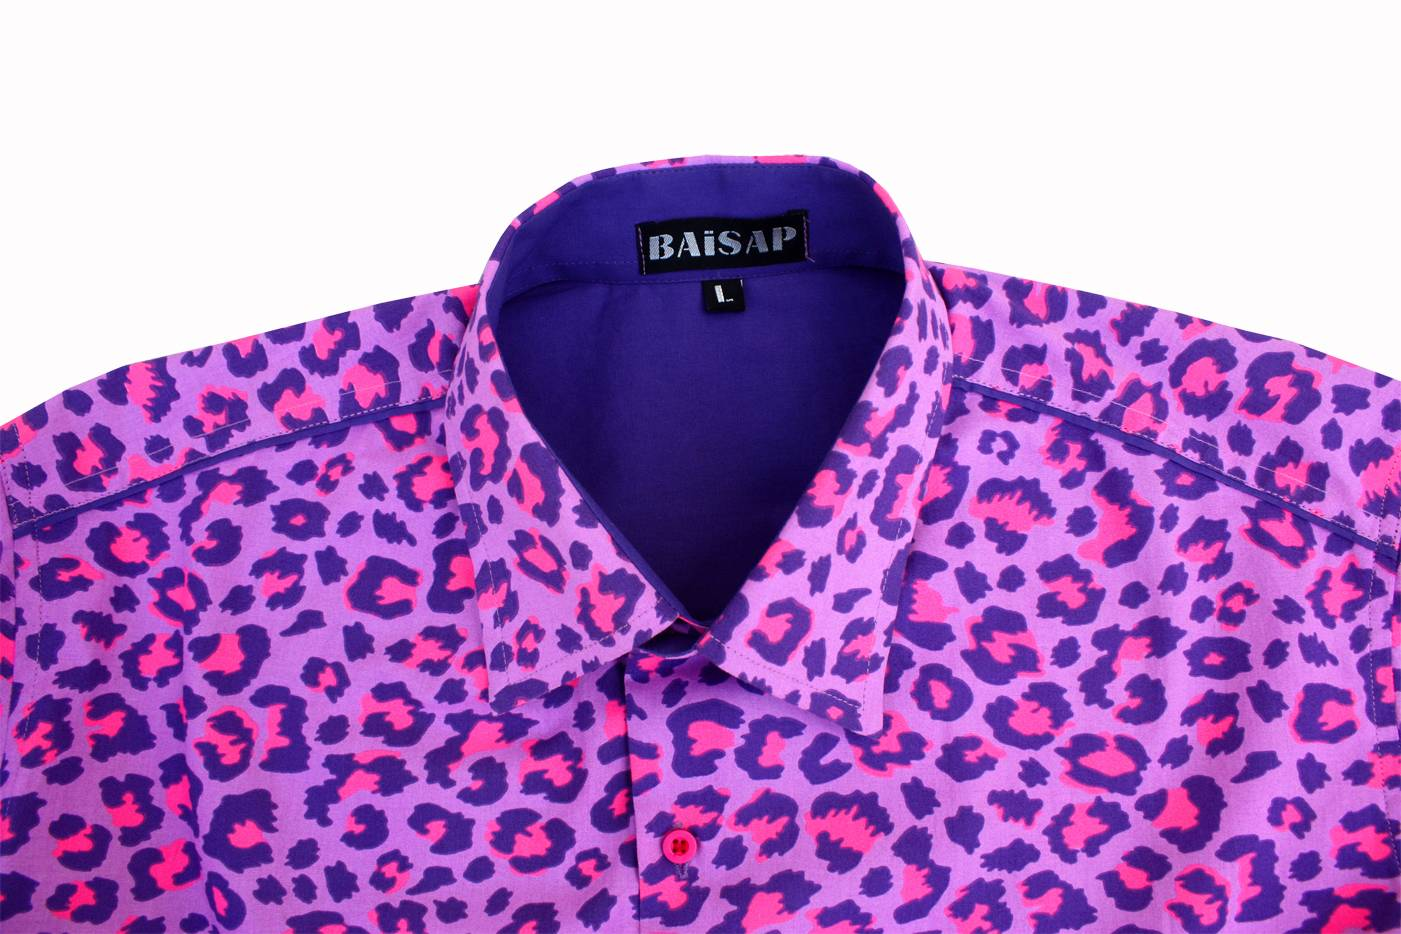 Baïsap Leopard Shirt For Men Short Sleeve Pink Dress